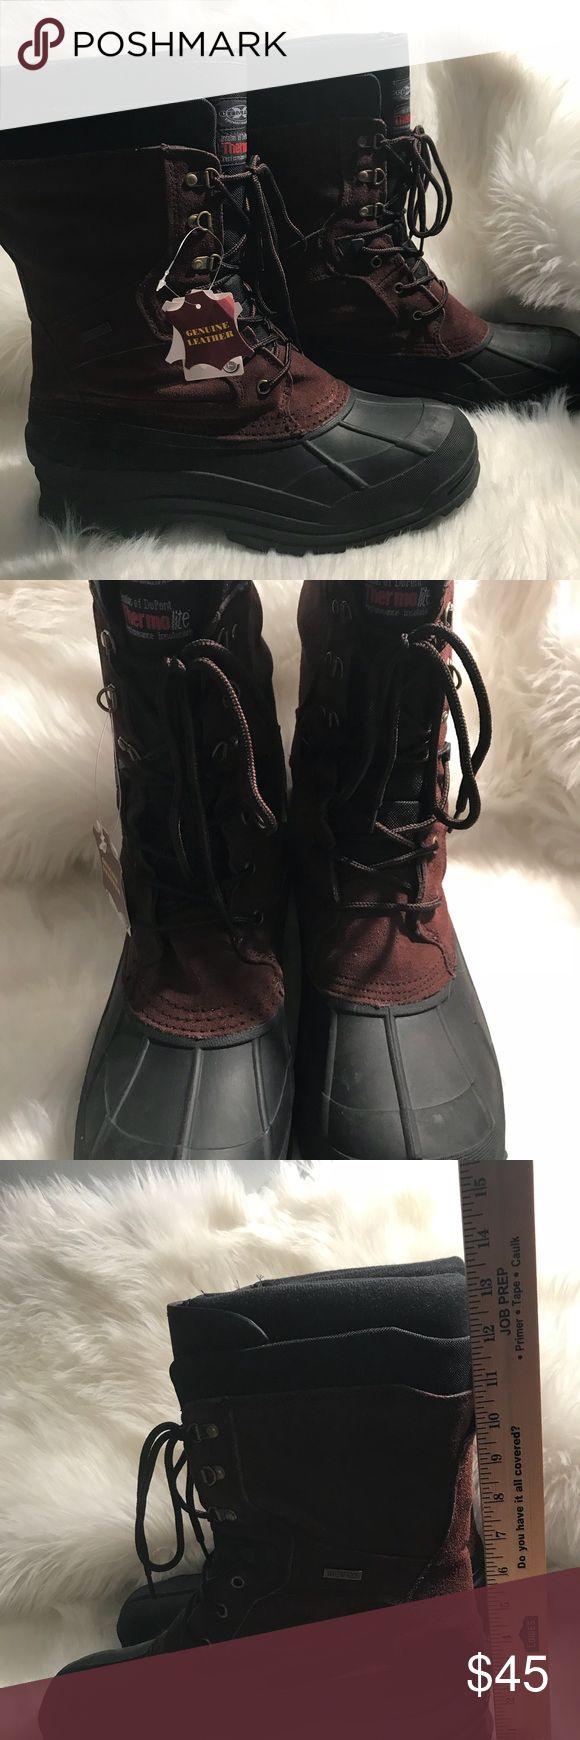 Brand new men's Tall winter snow ❄️ rain ☔️ Boot Brand new men's Tall Waterproof winter snow ❄️ rain ☔️ Boot many sizes available Shoes Winter & Rain Boots